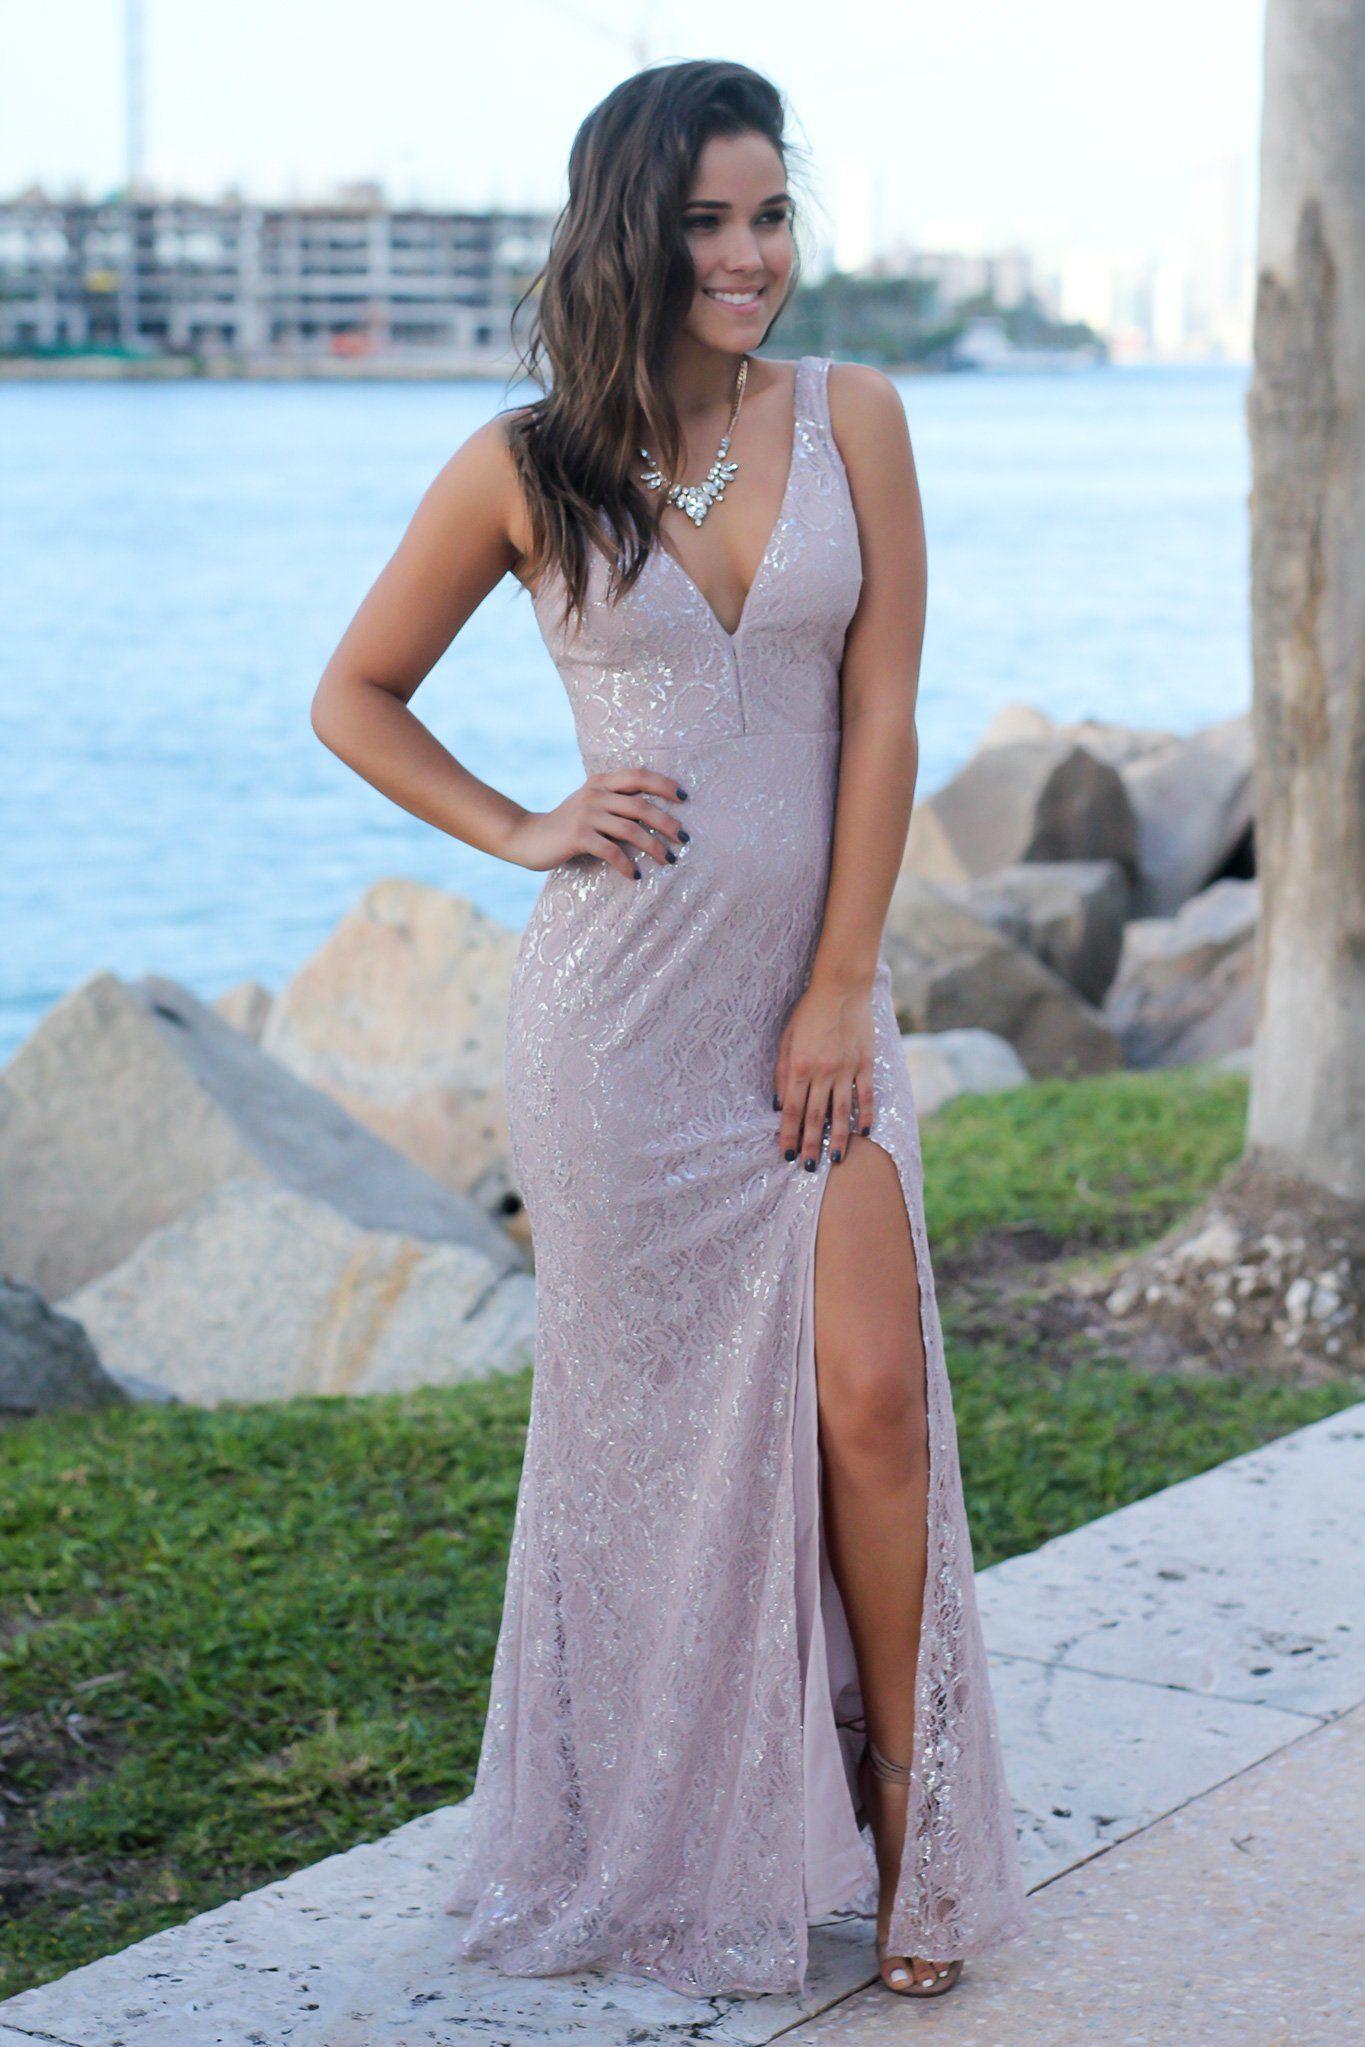 Park Art|My WordPress Blog_Lavender Maxi Dress For Wedding